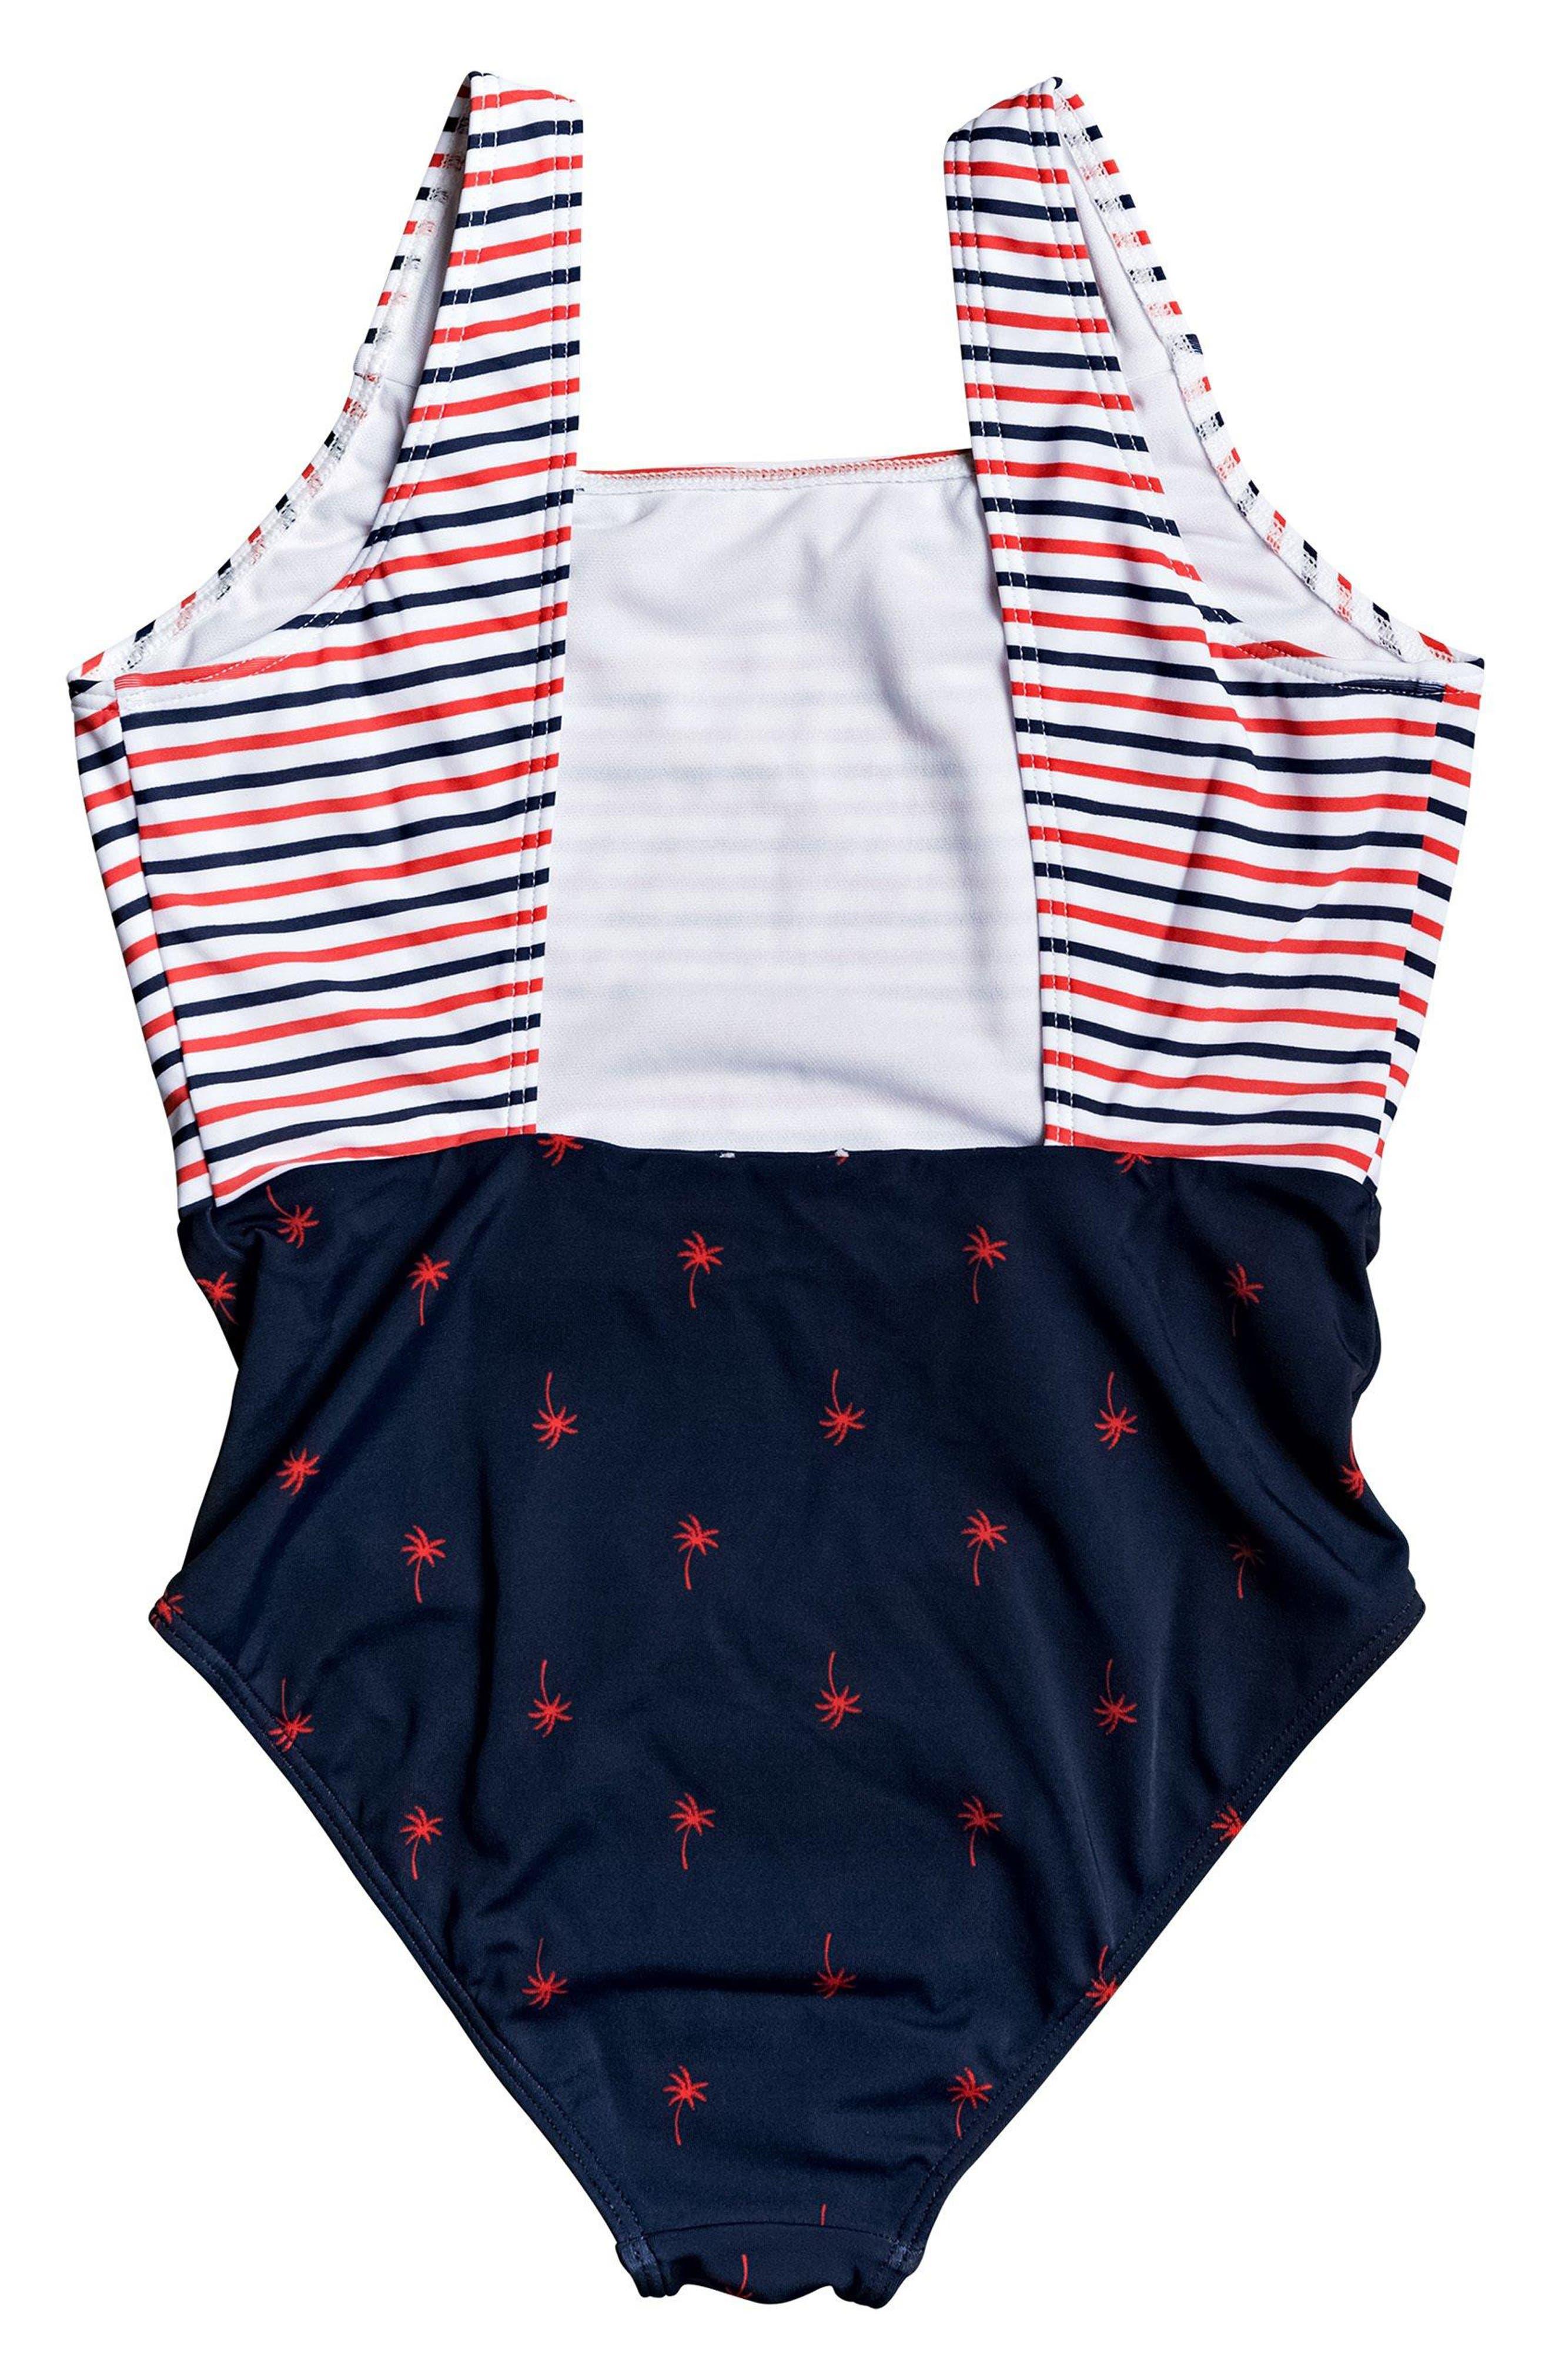 8e29aa916b Kids' Roxy Apparel: T-Shirts, Jeans, Pants & Hoodies | Nordstrom